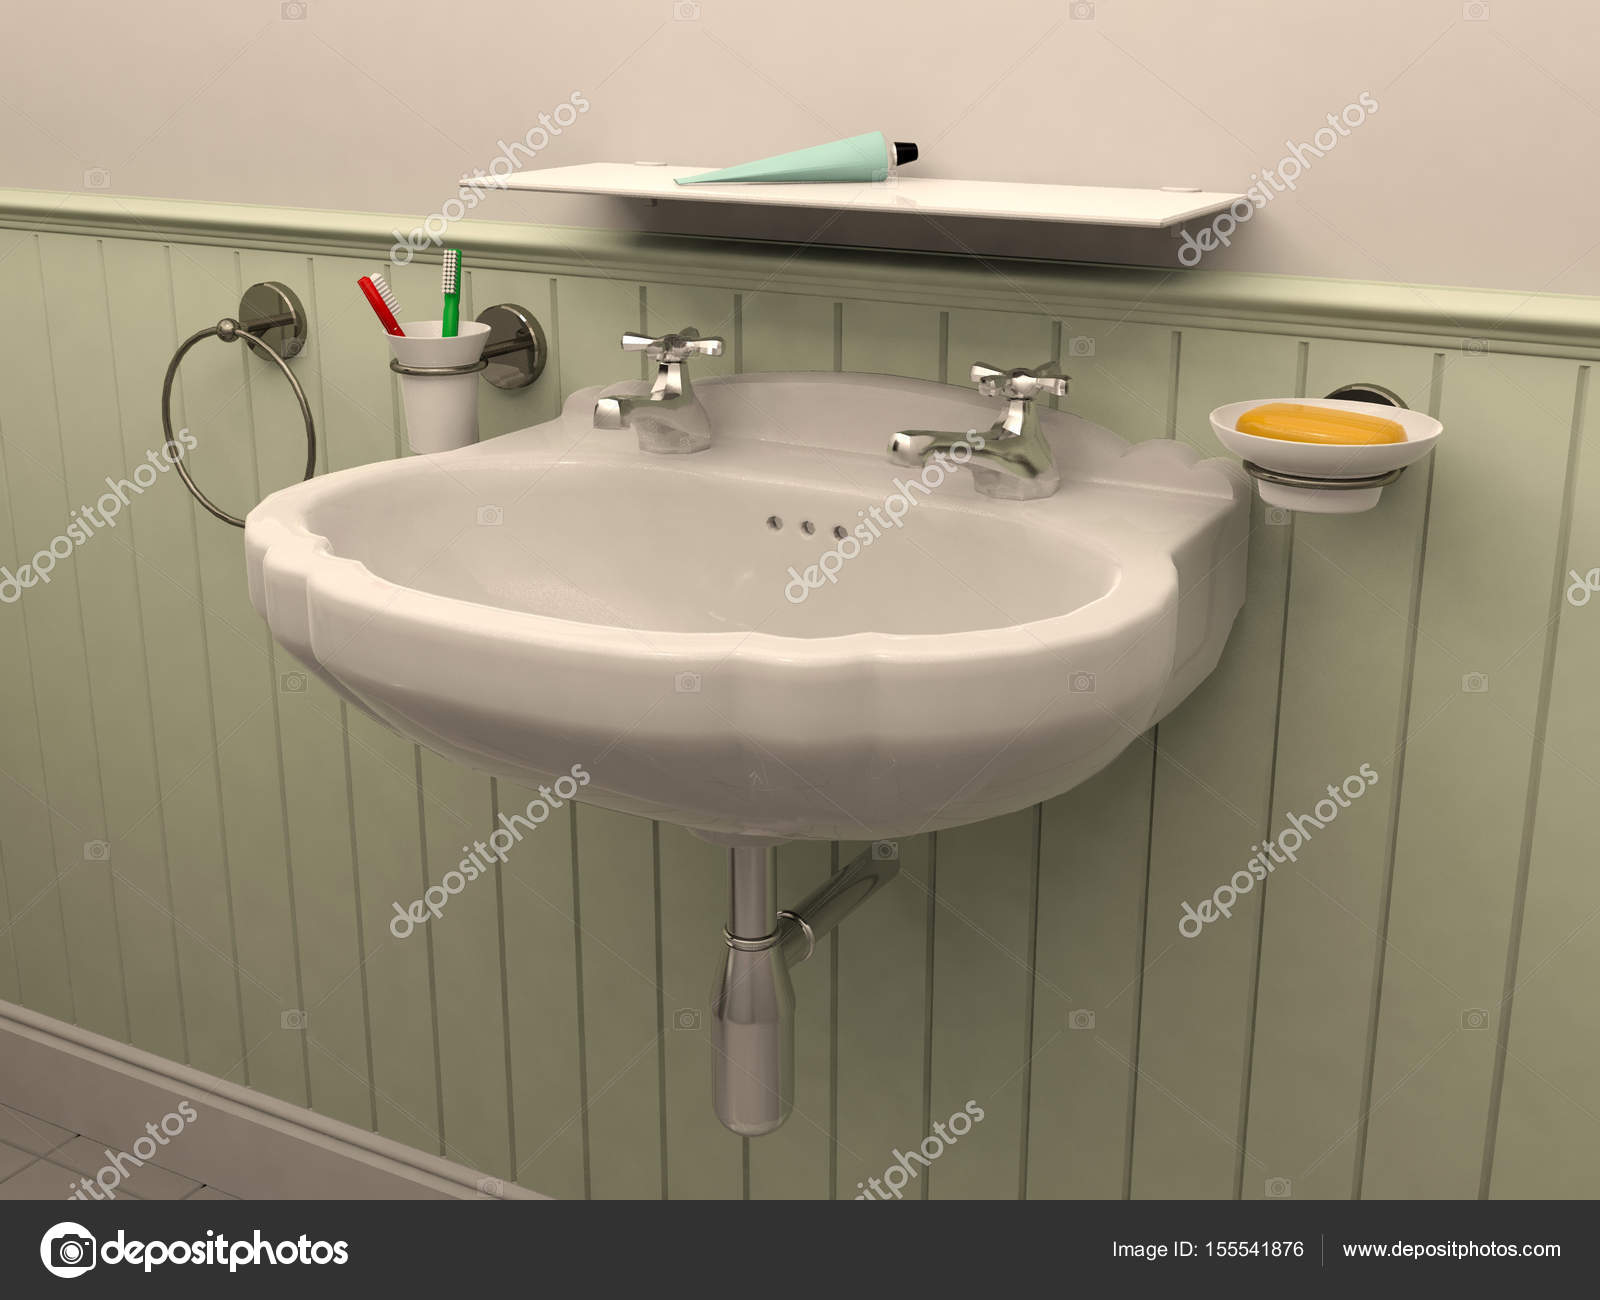 Washbasin in toilet room interior u2014 stock photo © geerati@gmail.com